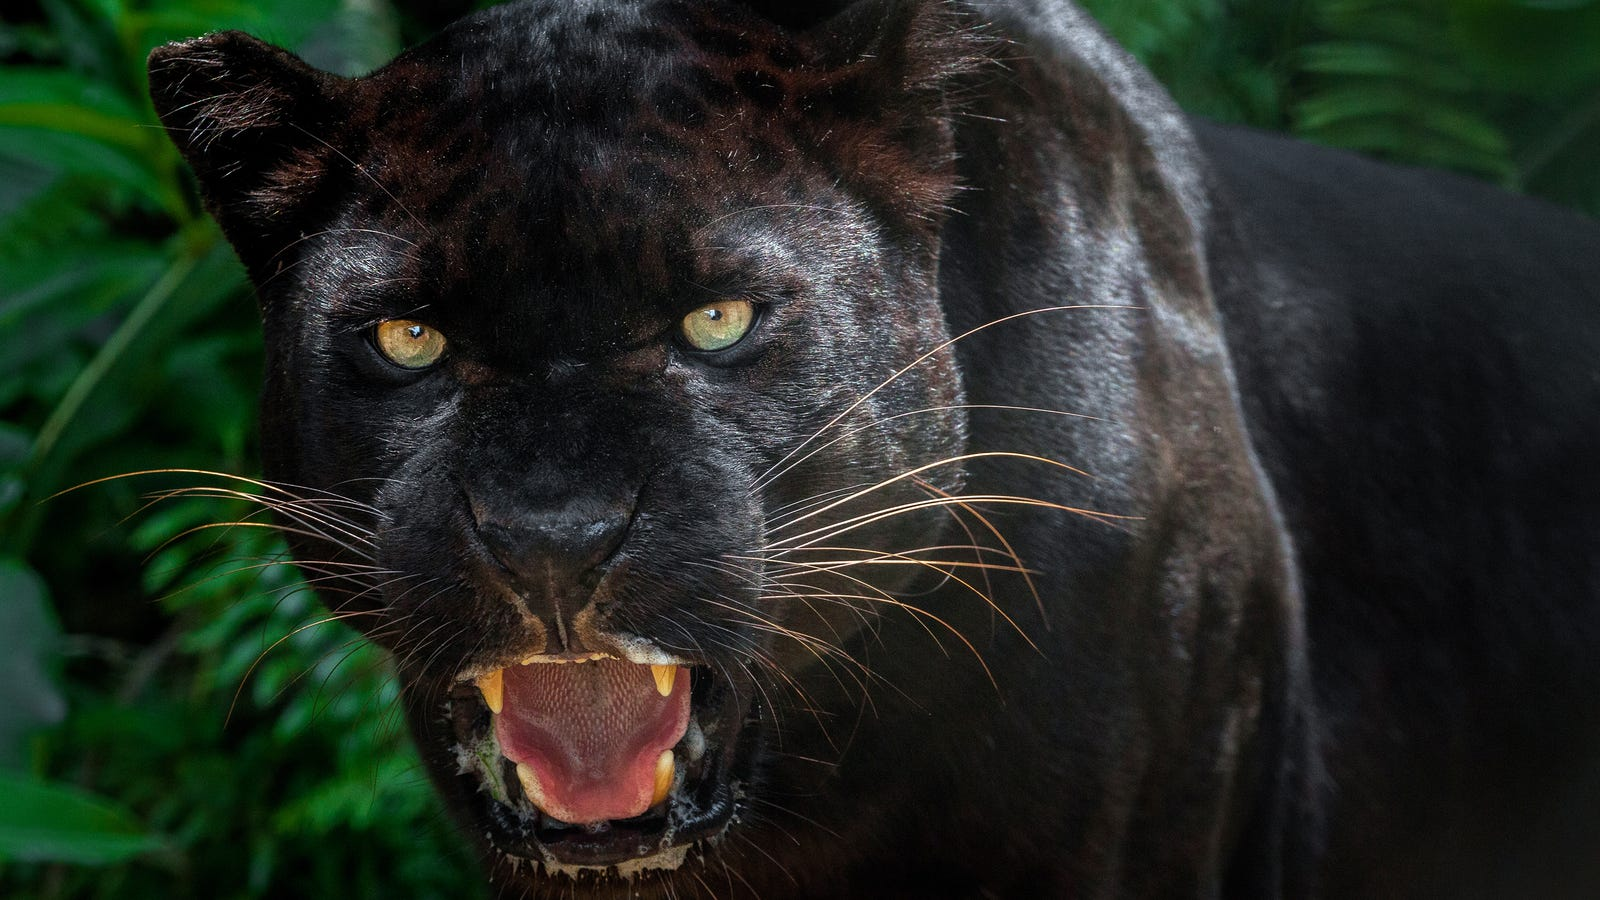 Scientists Photograph Rare Black Leopard in Kenya - photo#5